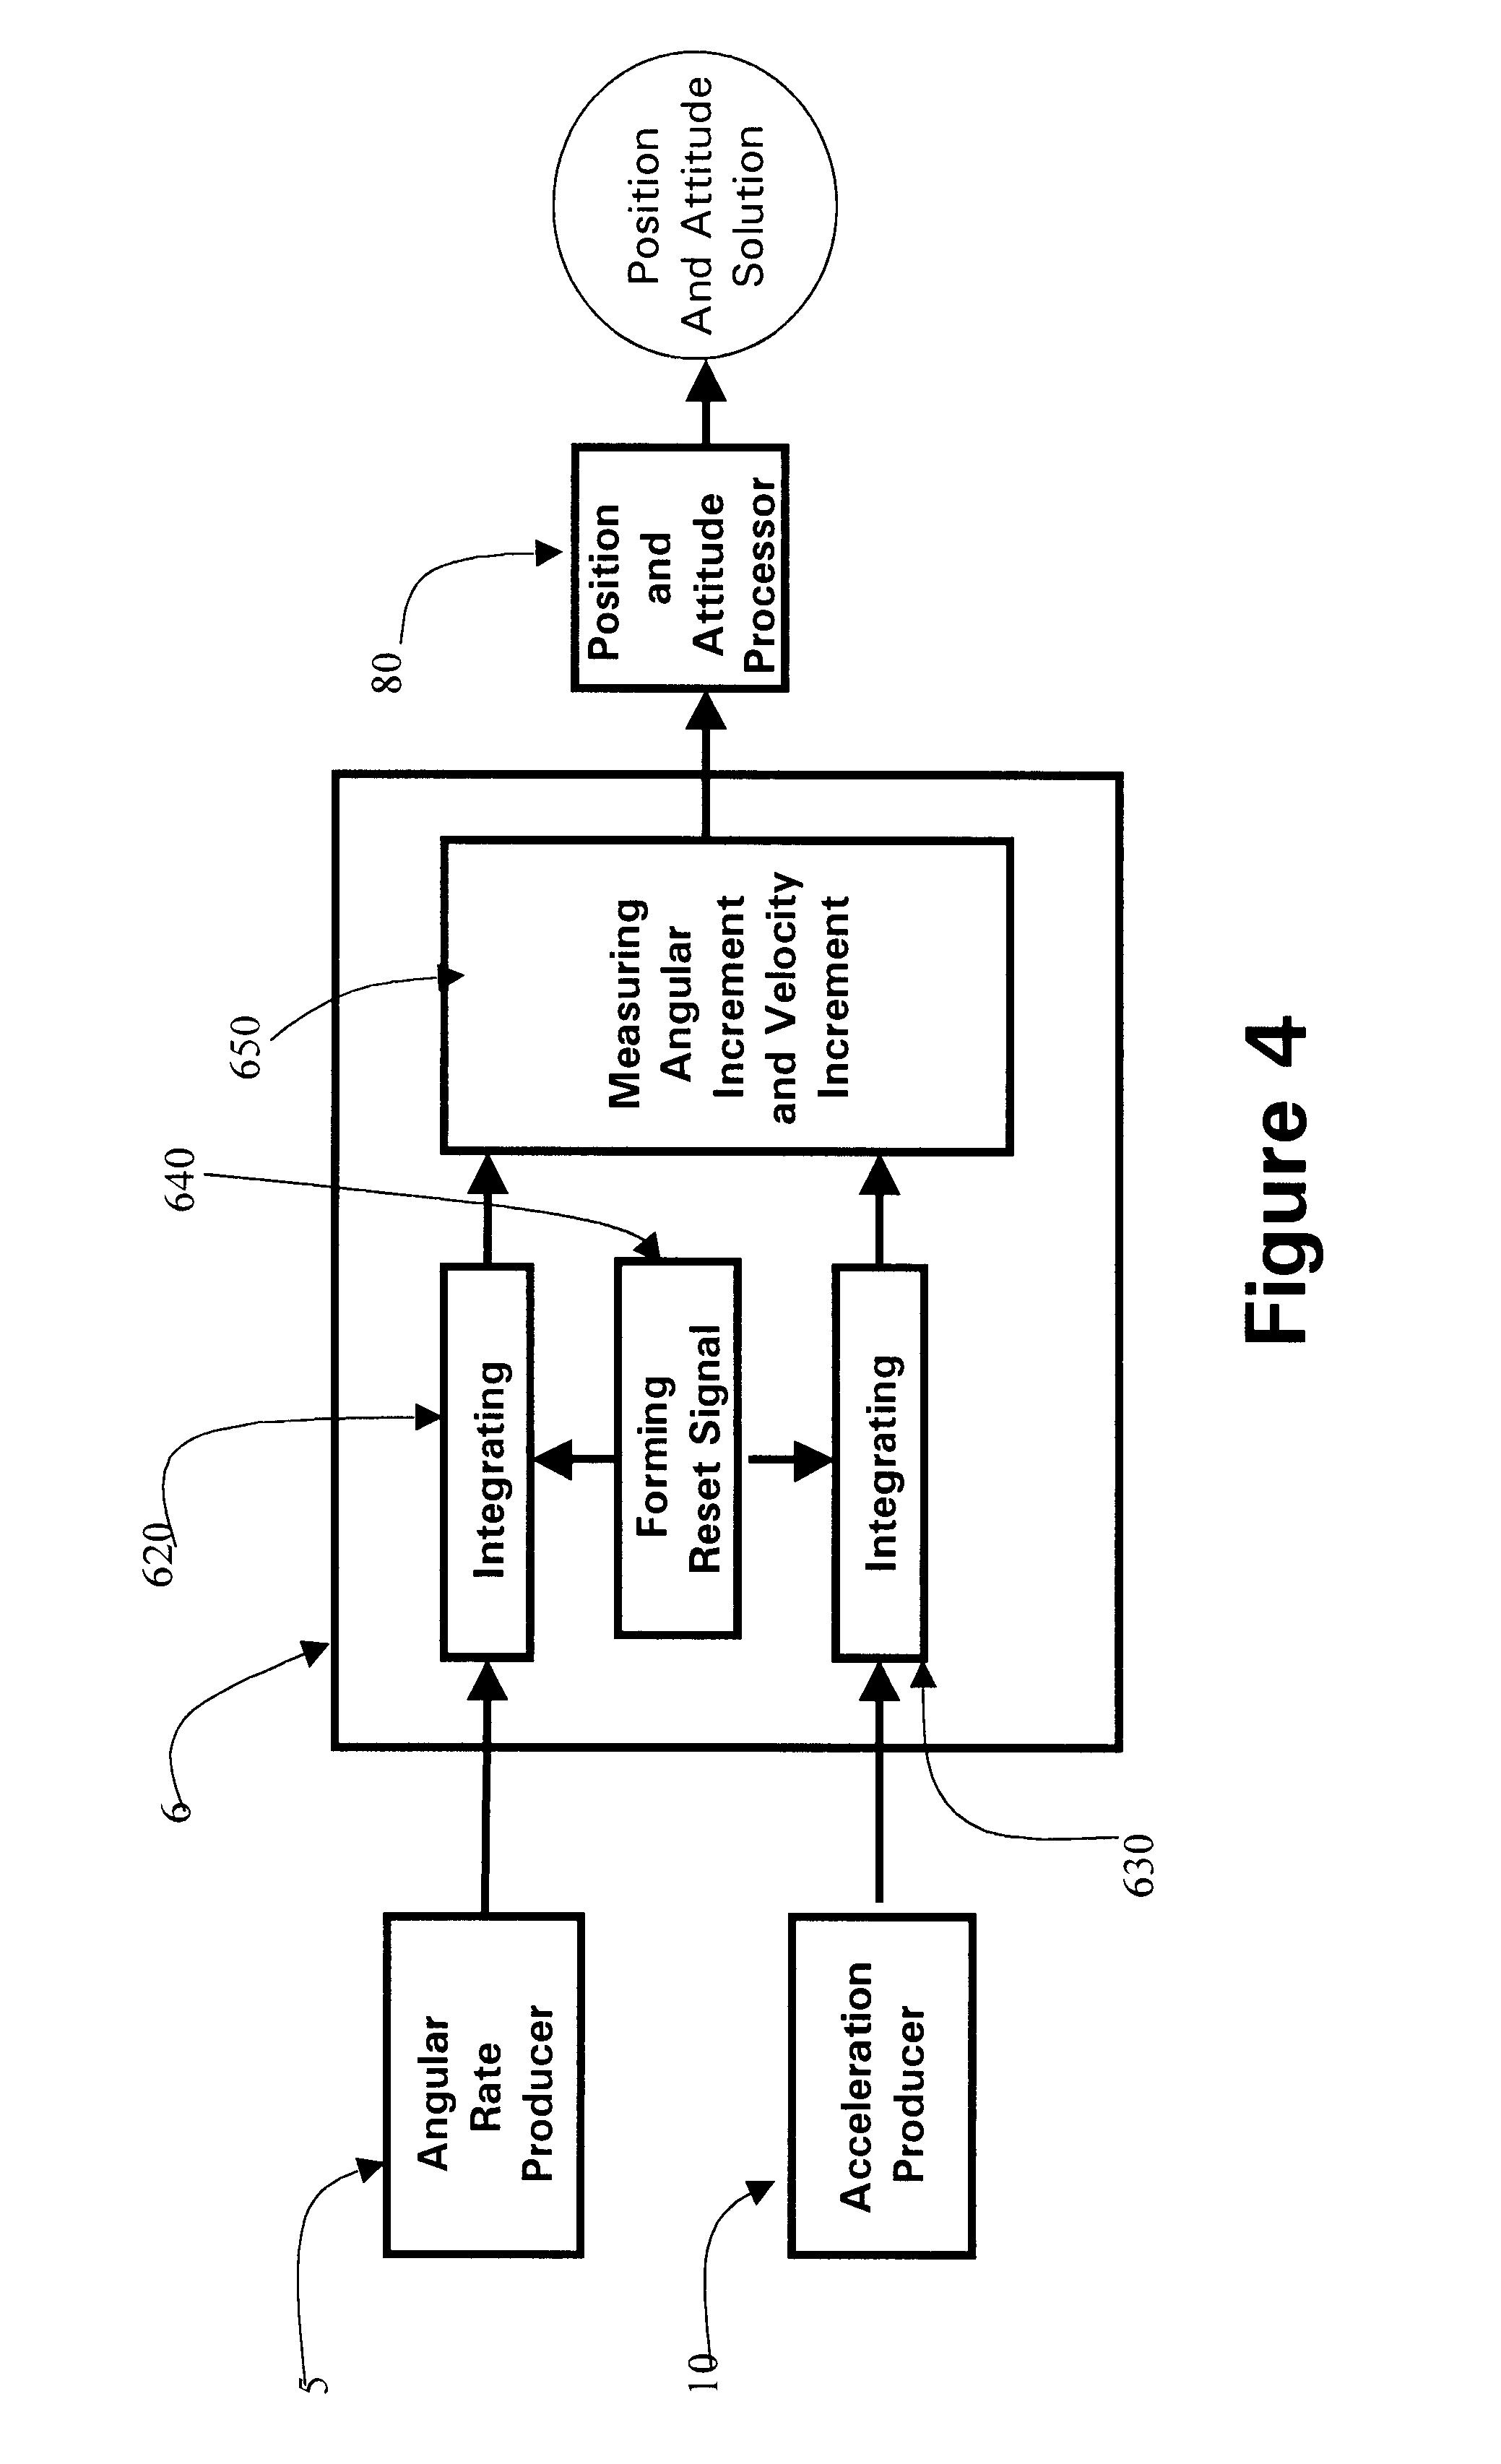 Bose 802 Wiring Diagram 23 Images Diagrams Schematics Us06671648 20031230 D00004 Patent Us6671648 Micro Inertial Measurement Unit Google Patents At